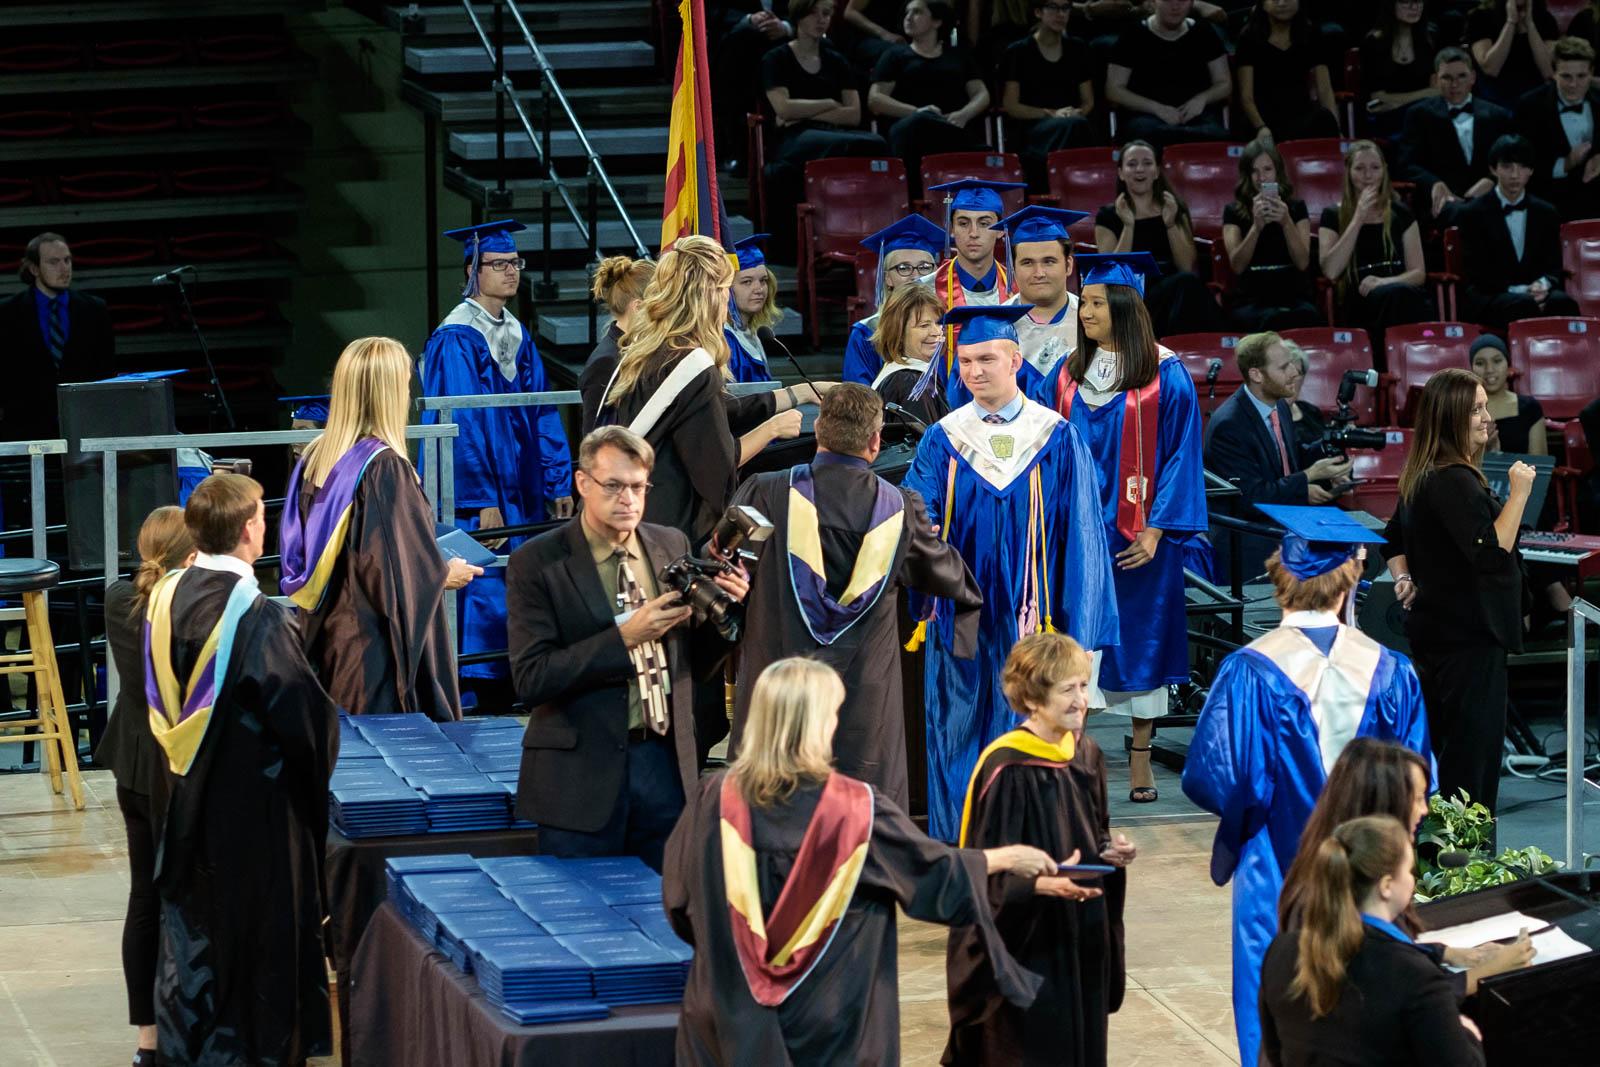 Matthew receives his diploma